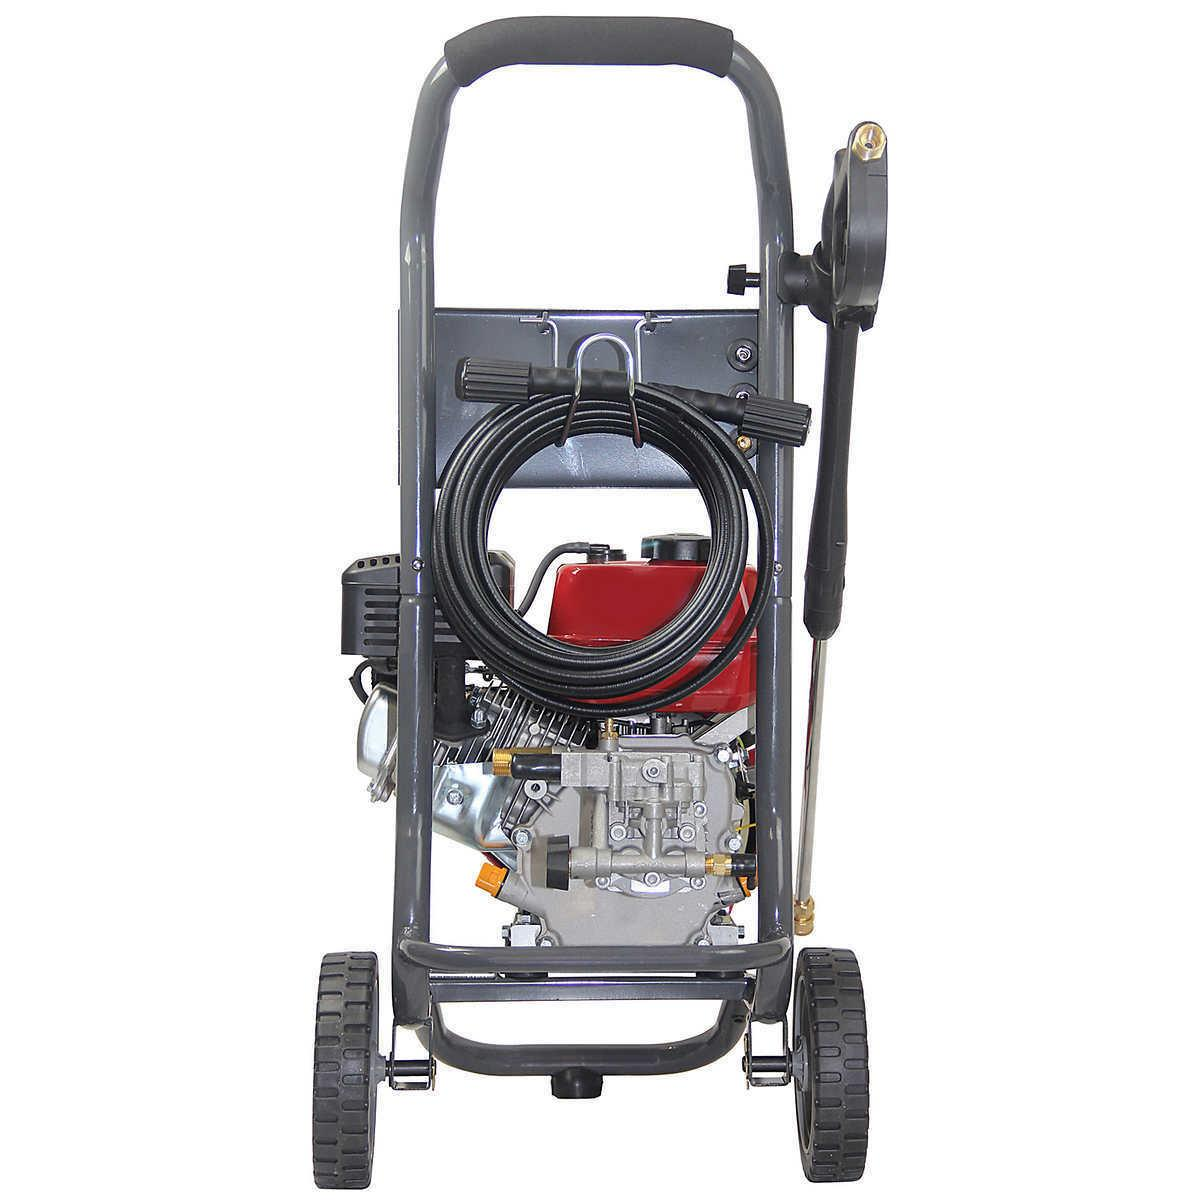 A-iPower High 2700 PSI 2.3 GPM Gas 2yrs Warranty